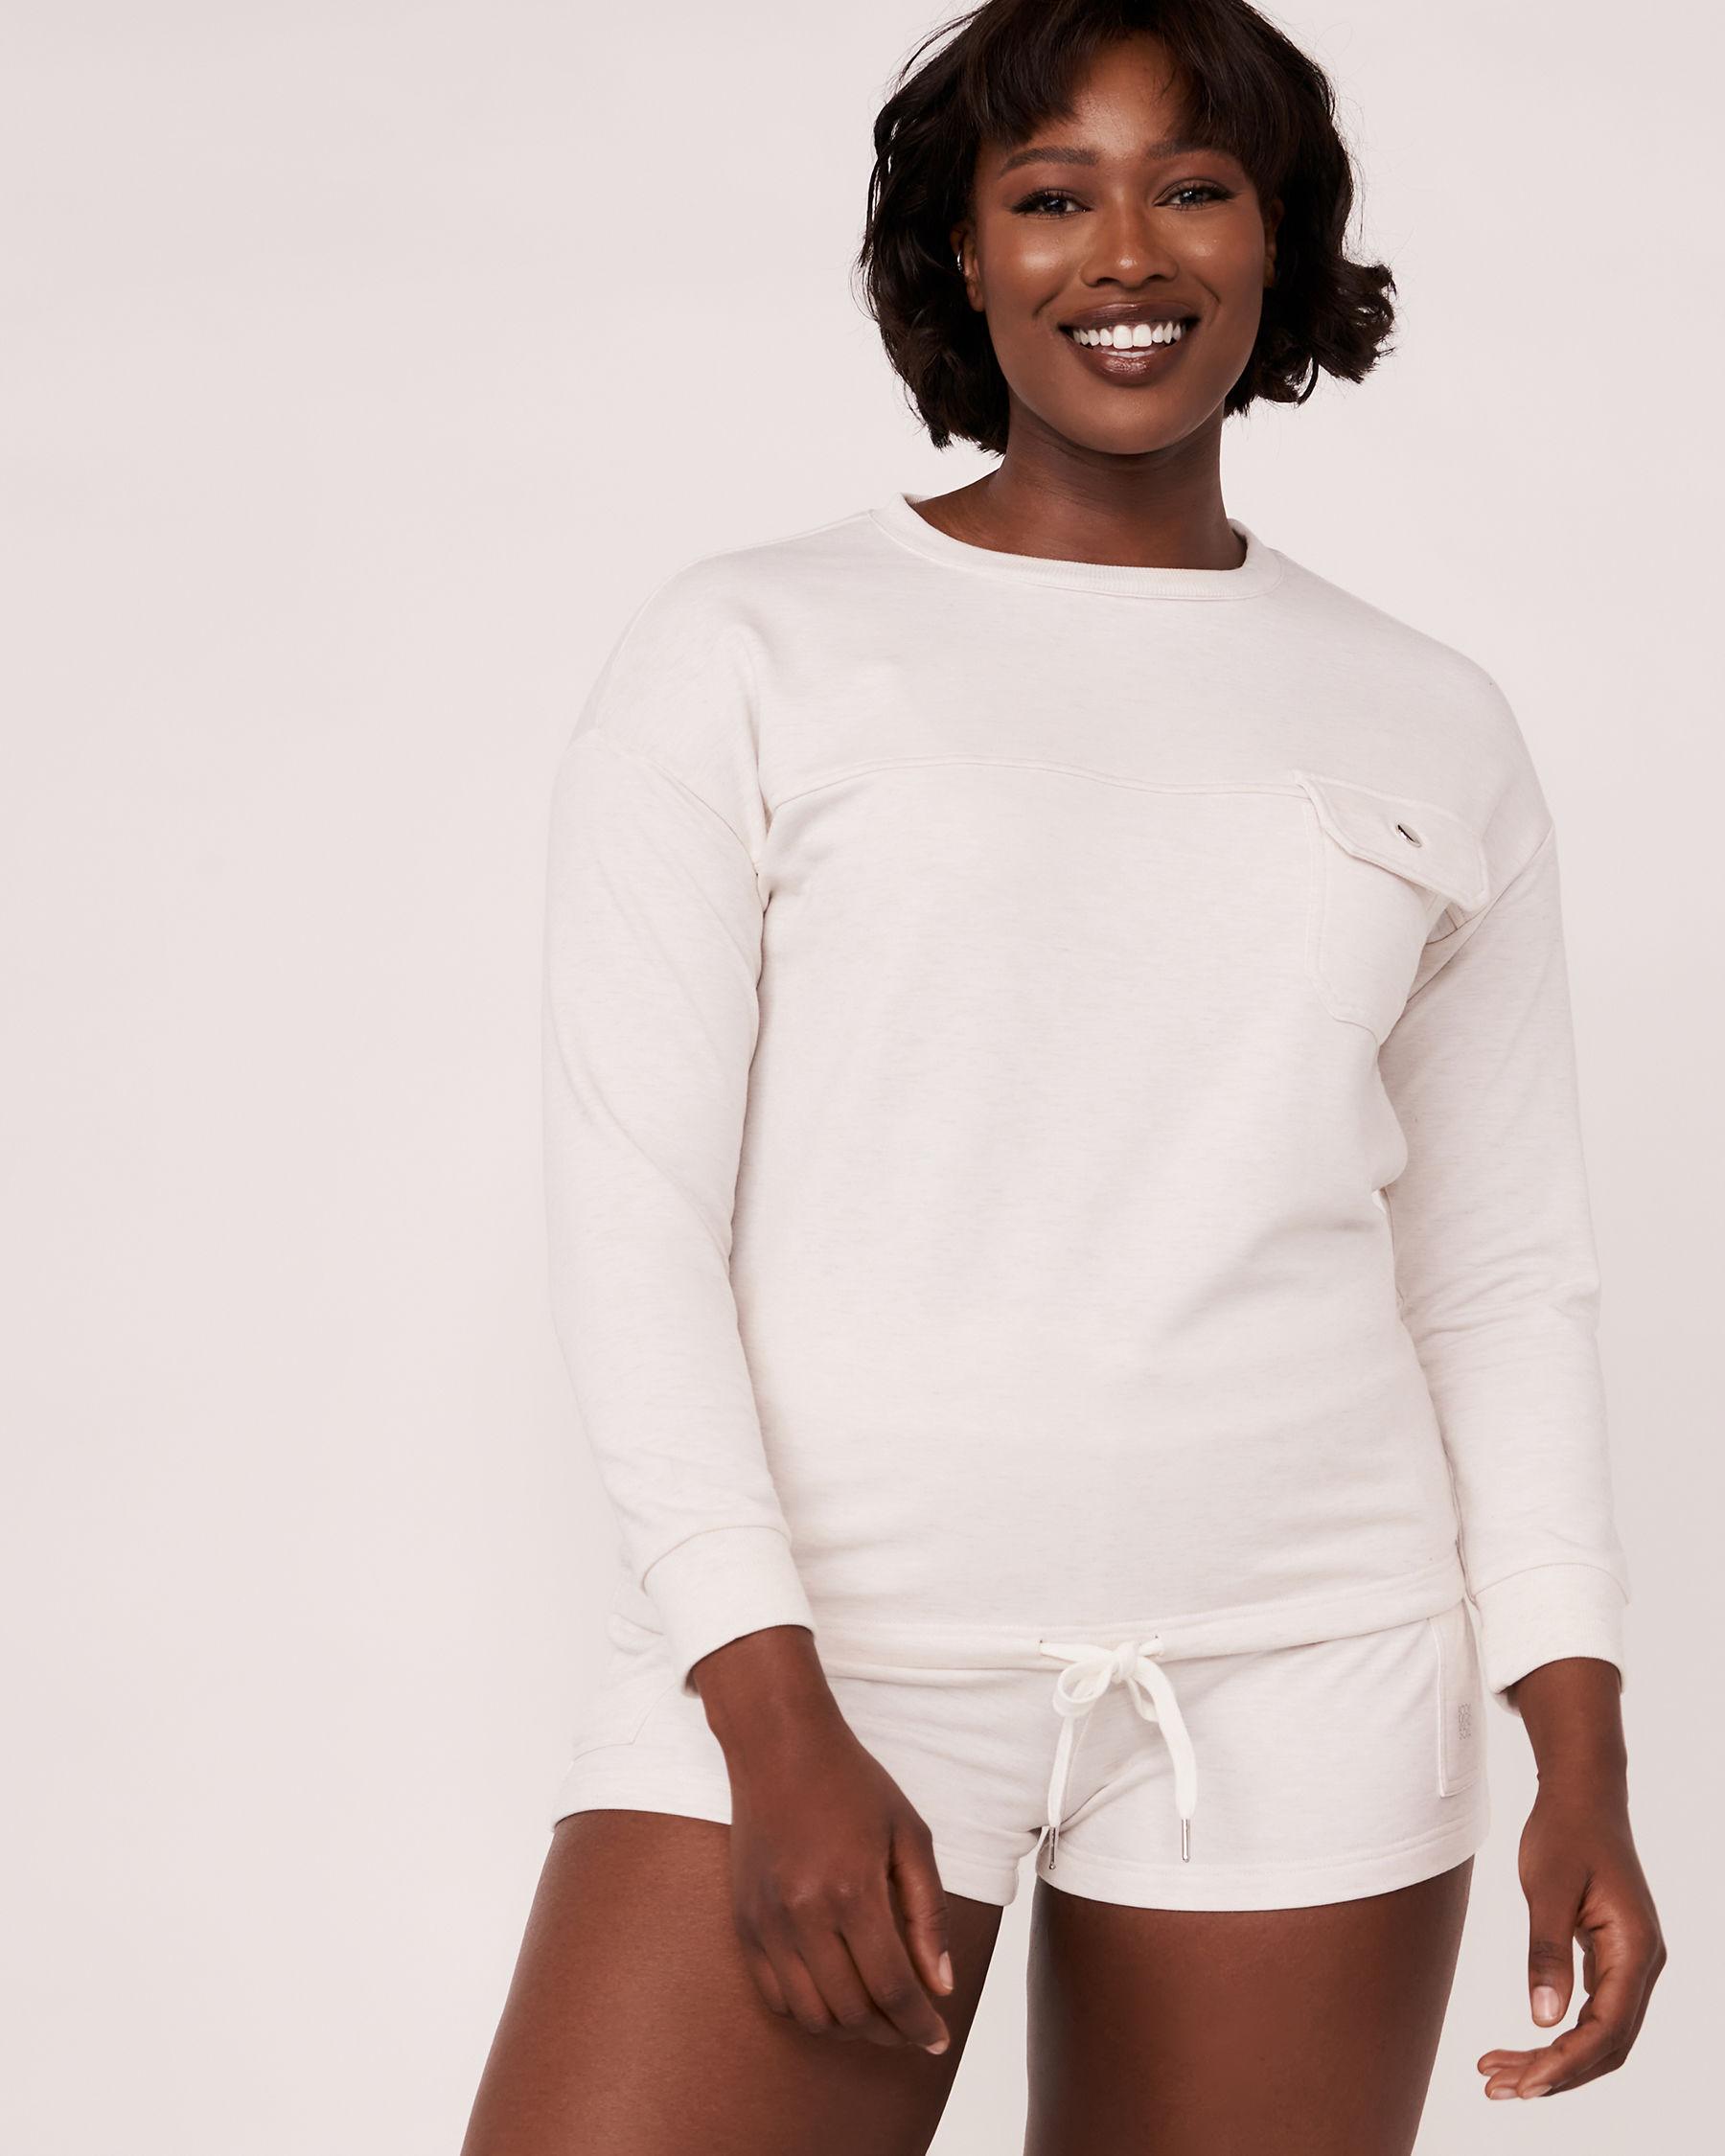 LA VIE EN ROSE Patch Pocket Long Sleeve Shirt Soft grey 50100004 - View1